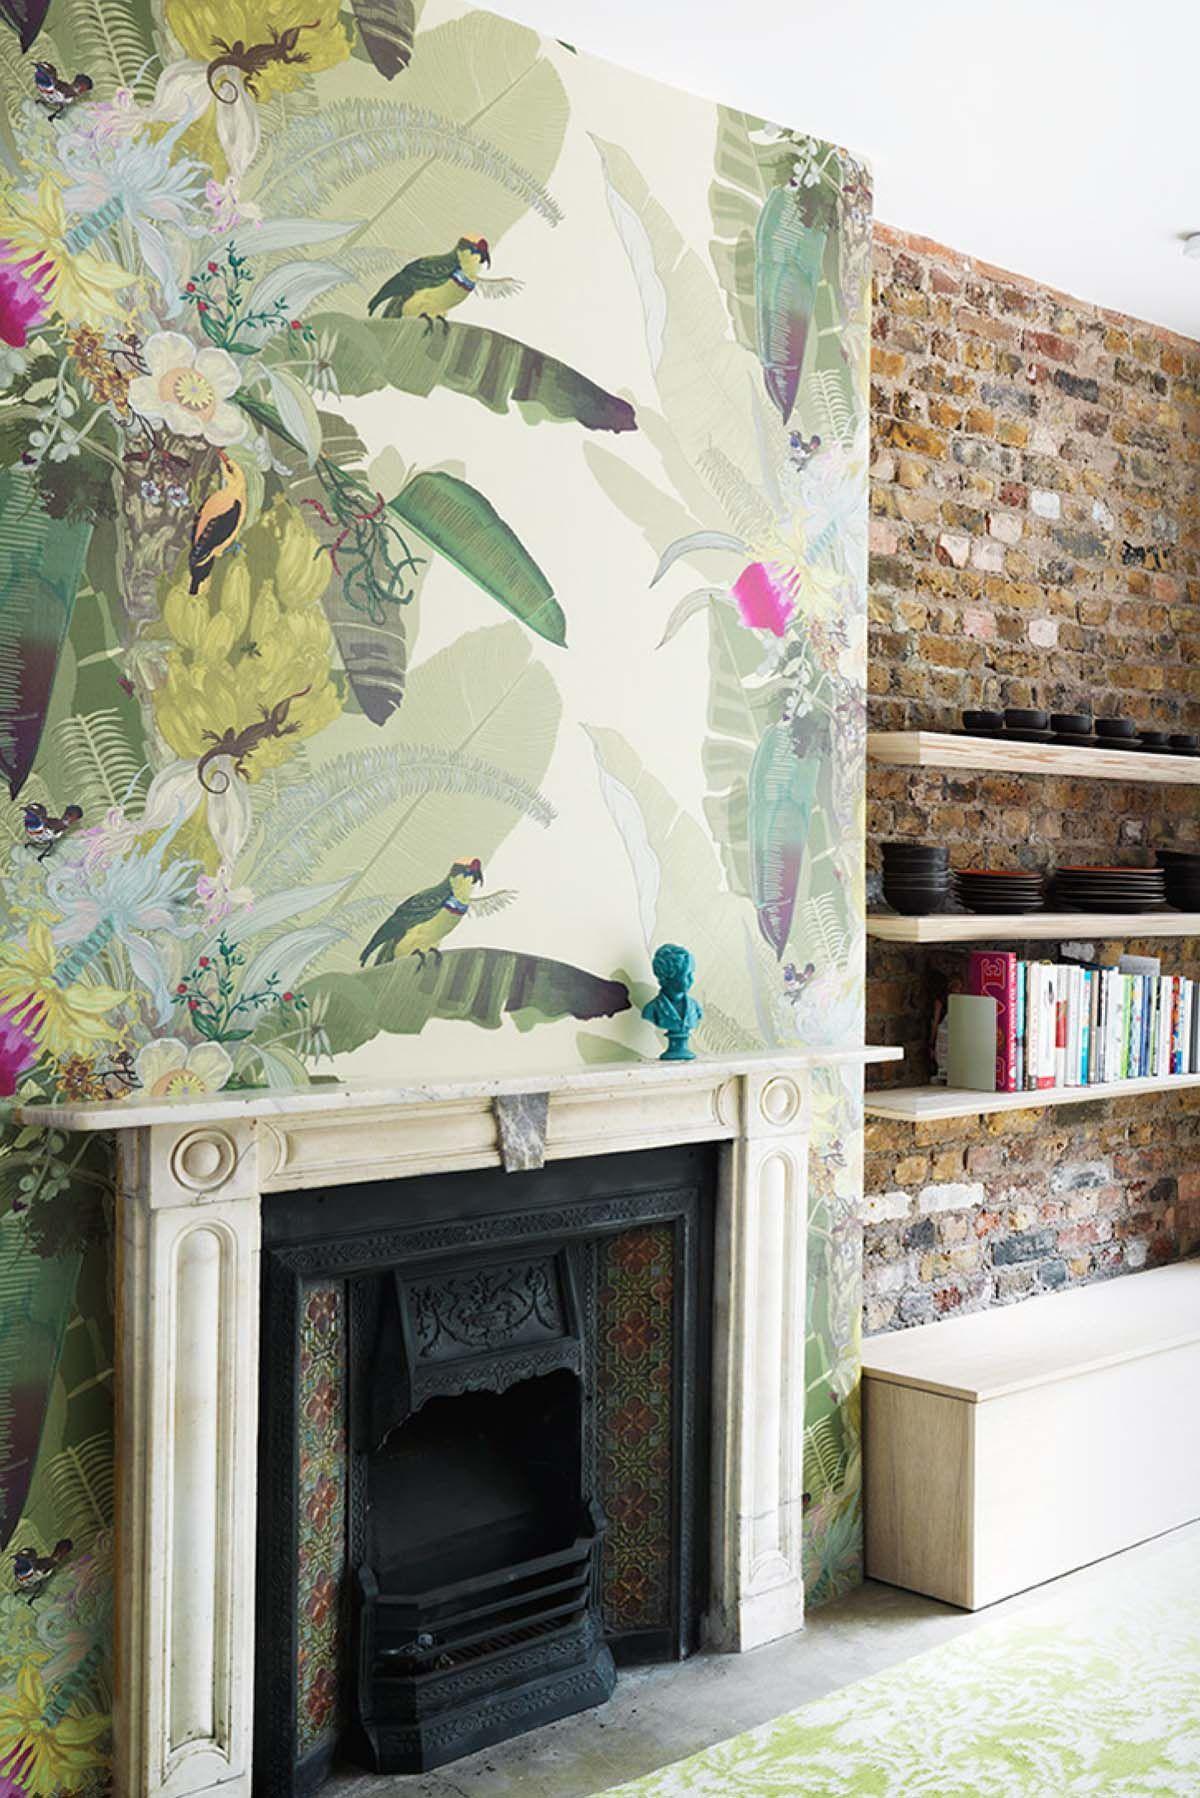 Timorous beasties on pinterest nina campbell designer wallpaper and cole and son - Wallpaper volwassen kamer trendy ...